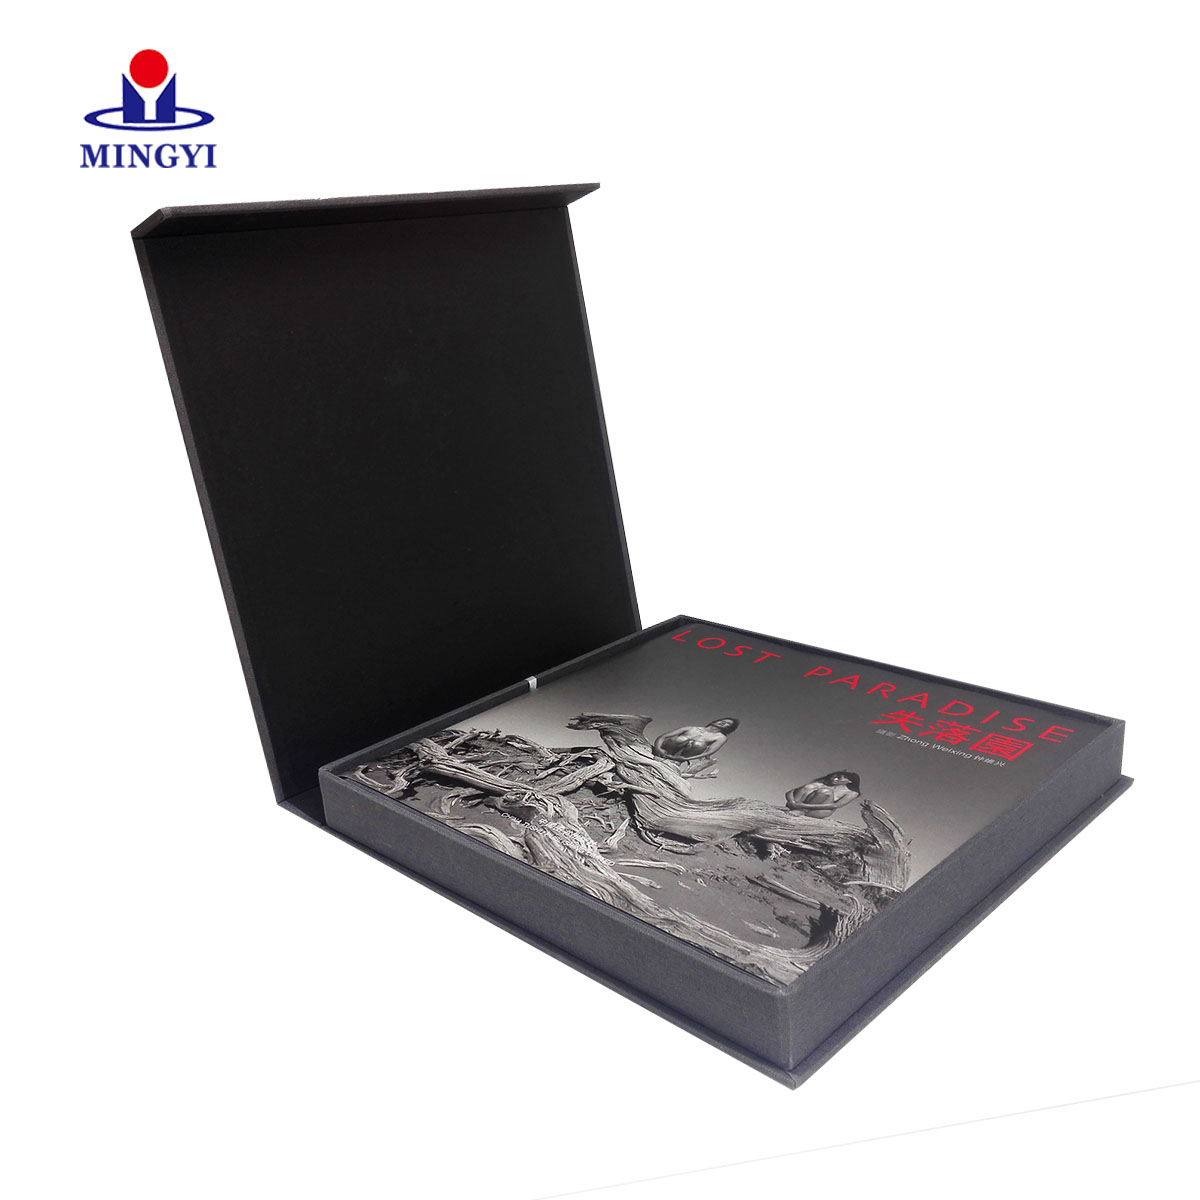 Mingyi Printing Array image120